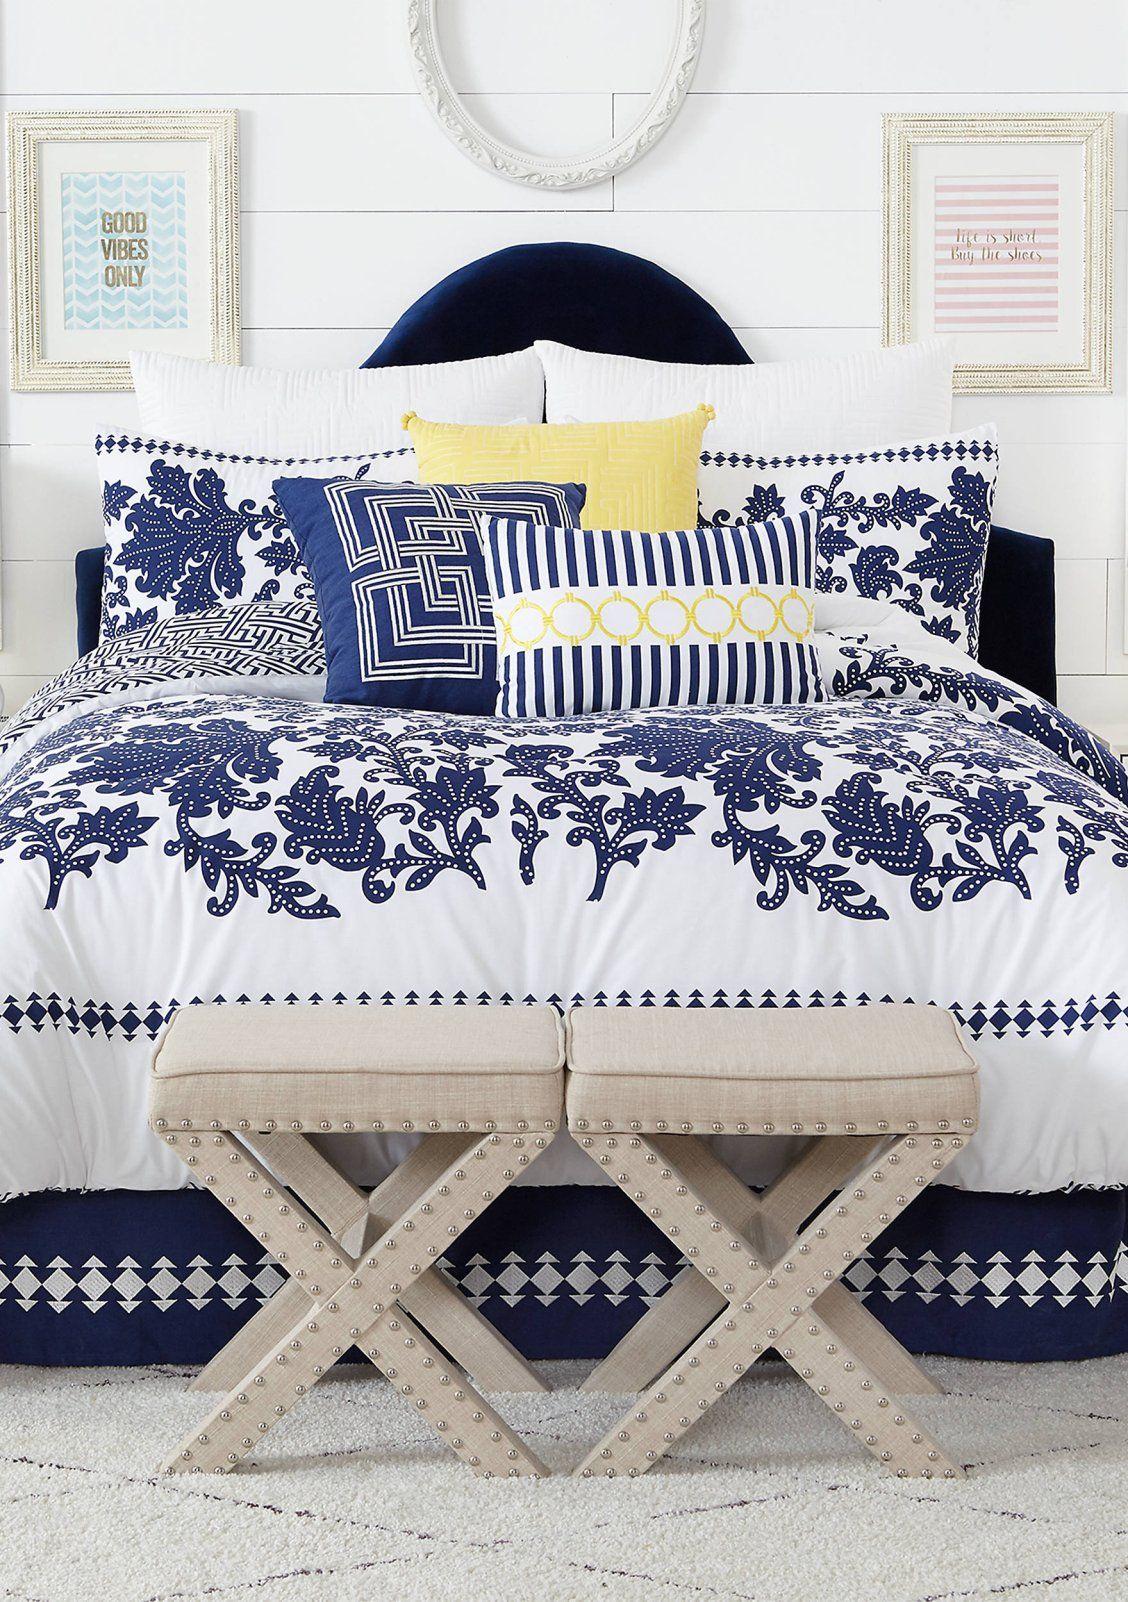 Crown Ivy Avery Comforter Set Comforter Sets Bedding Master Bedroom King Comforter Sets White comforter with navy trim